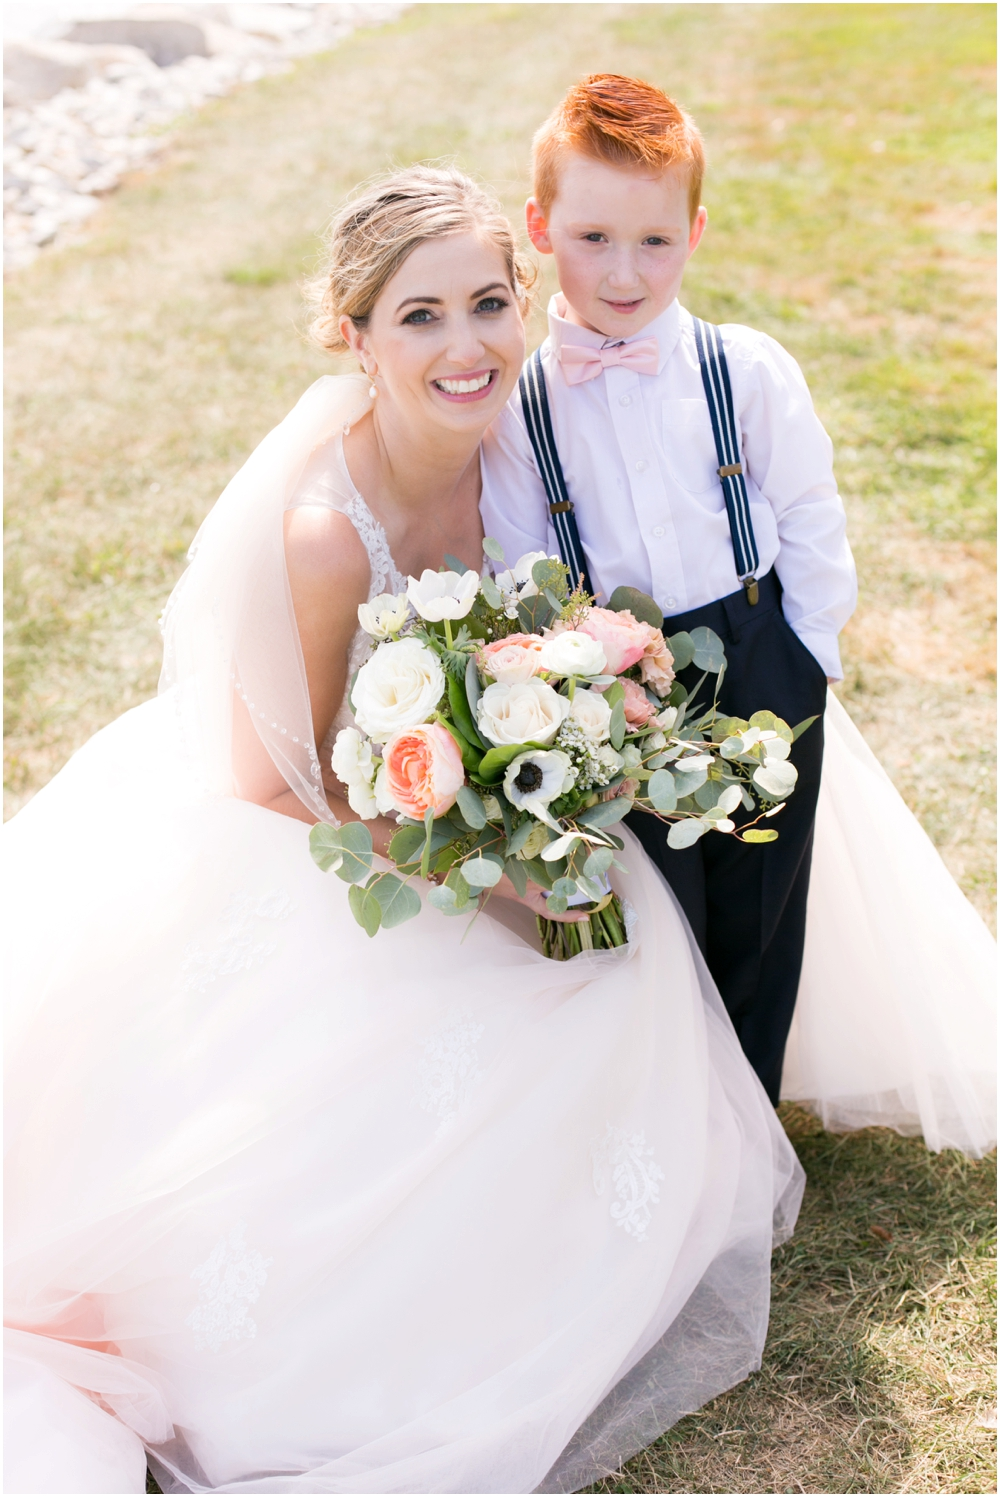 Oak-Island-Wedding-Chantal-Routhier-Photography_0015.jpg